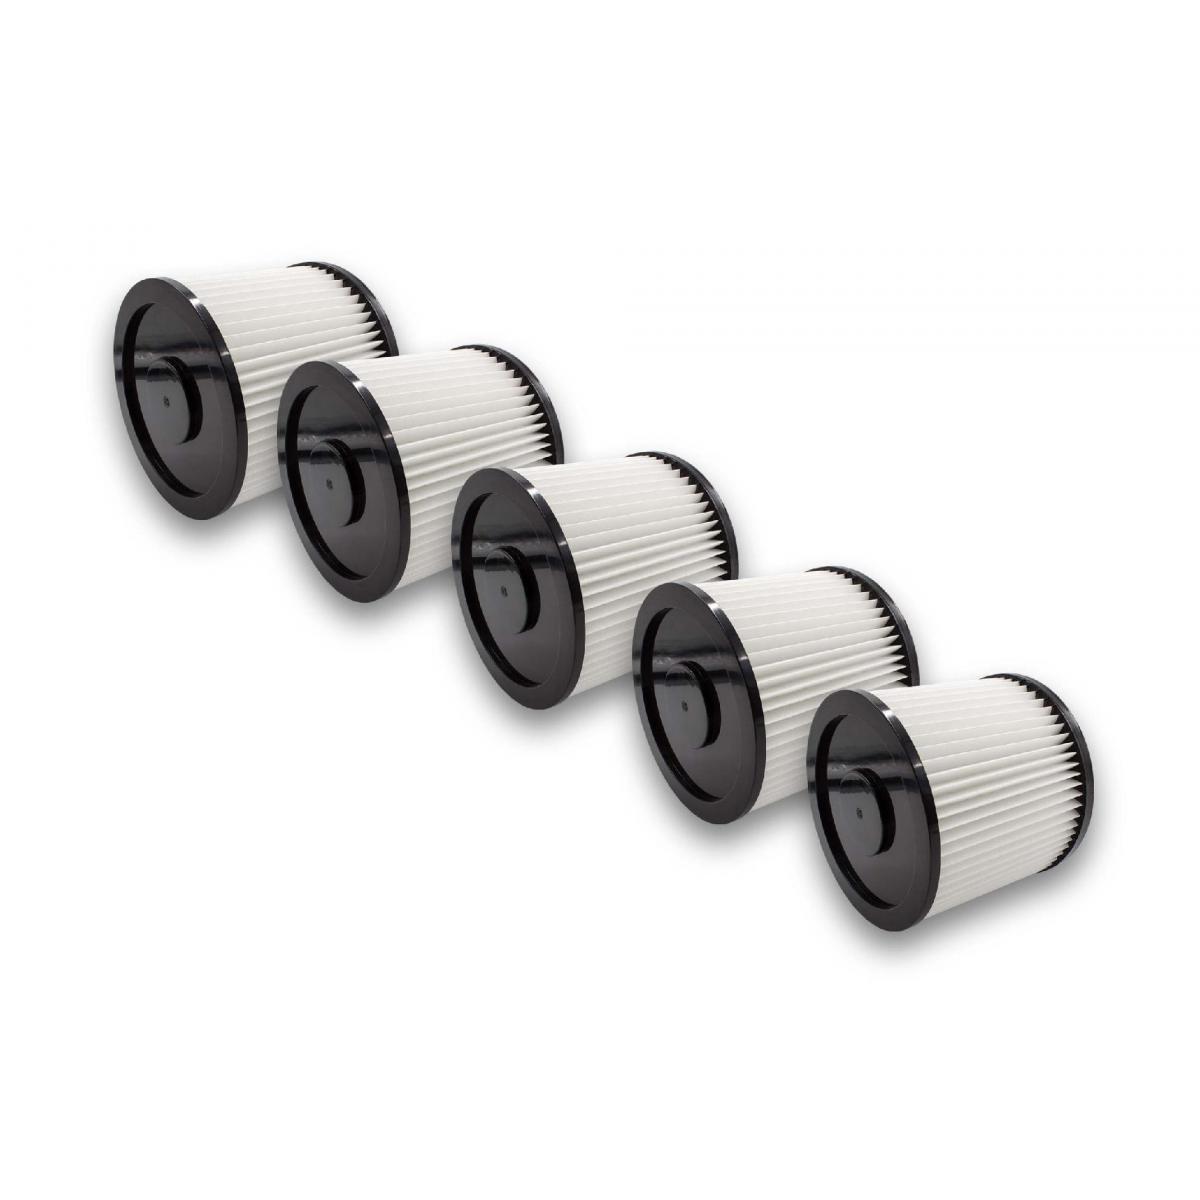 Vhbw vhbw 5x Filtres à cartouche pour aspirateur, aspirateur multifonctions aspirateur robot OBI NTS 20, NTS 30